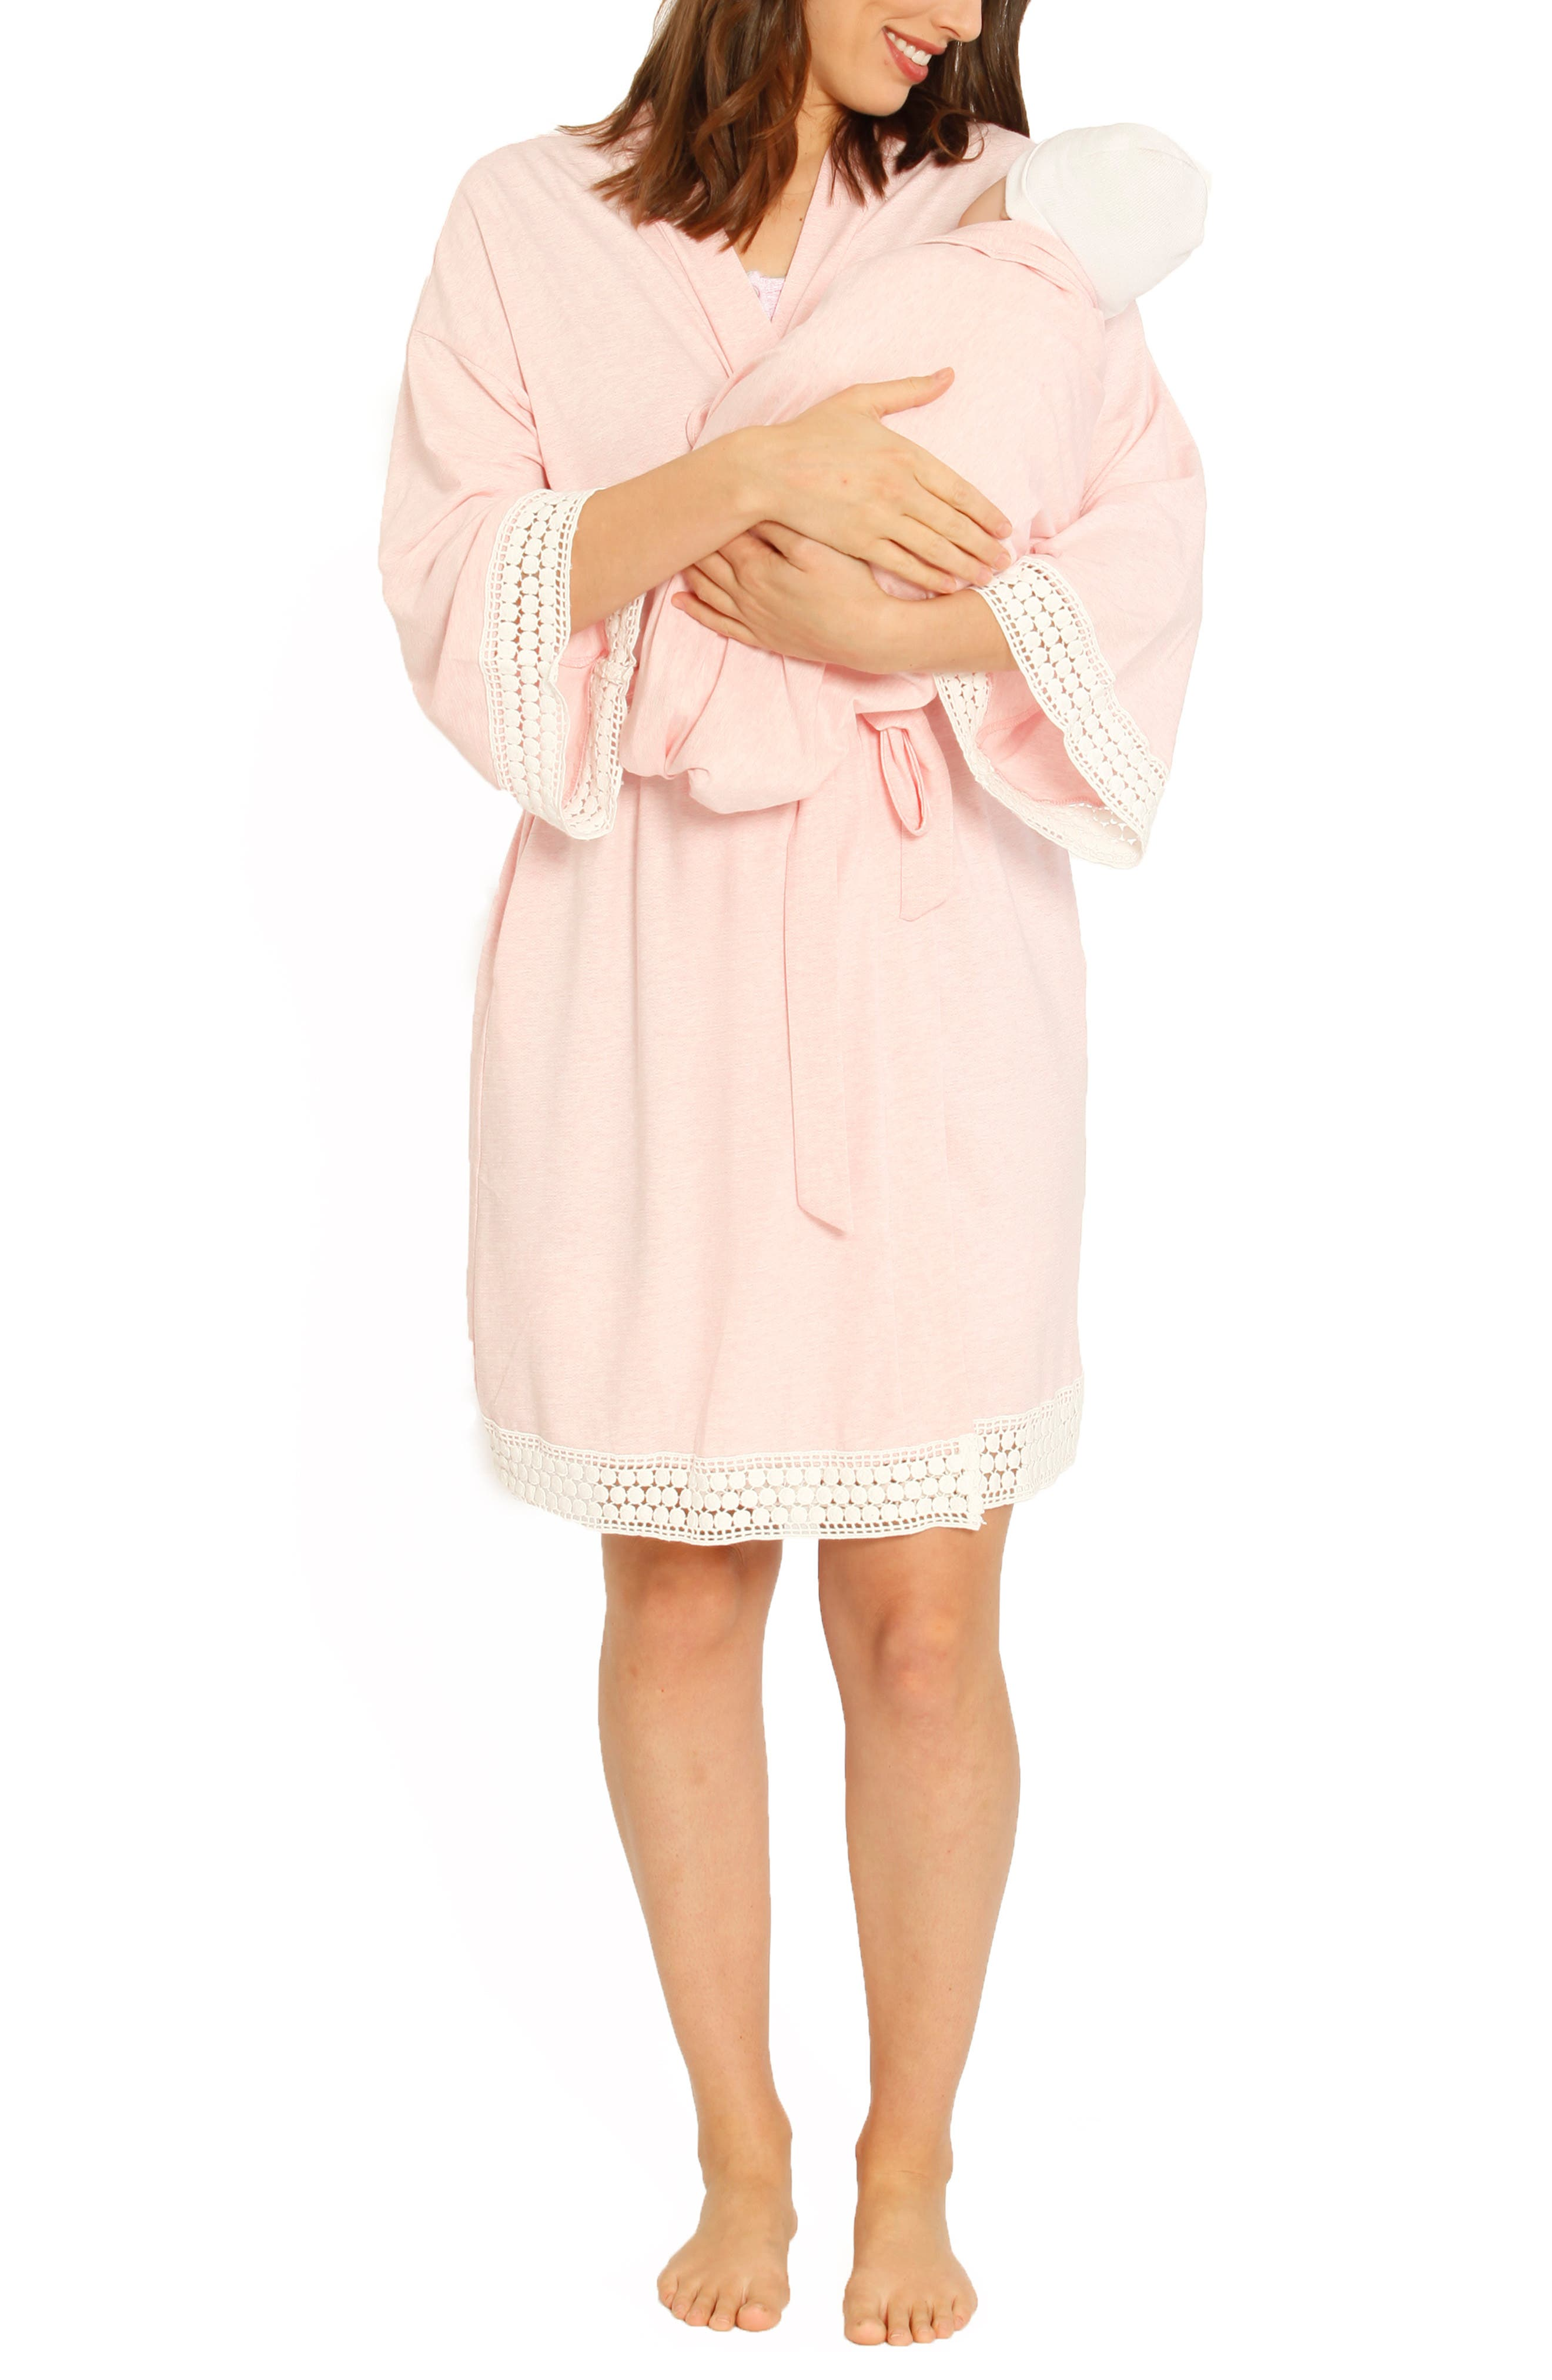 Ruby Joy Maternity/Nursing Sleep Shirt, Robe & Baby Blanket Pouch Set, Main, color, PINK